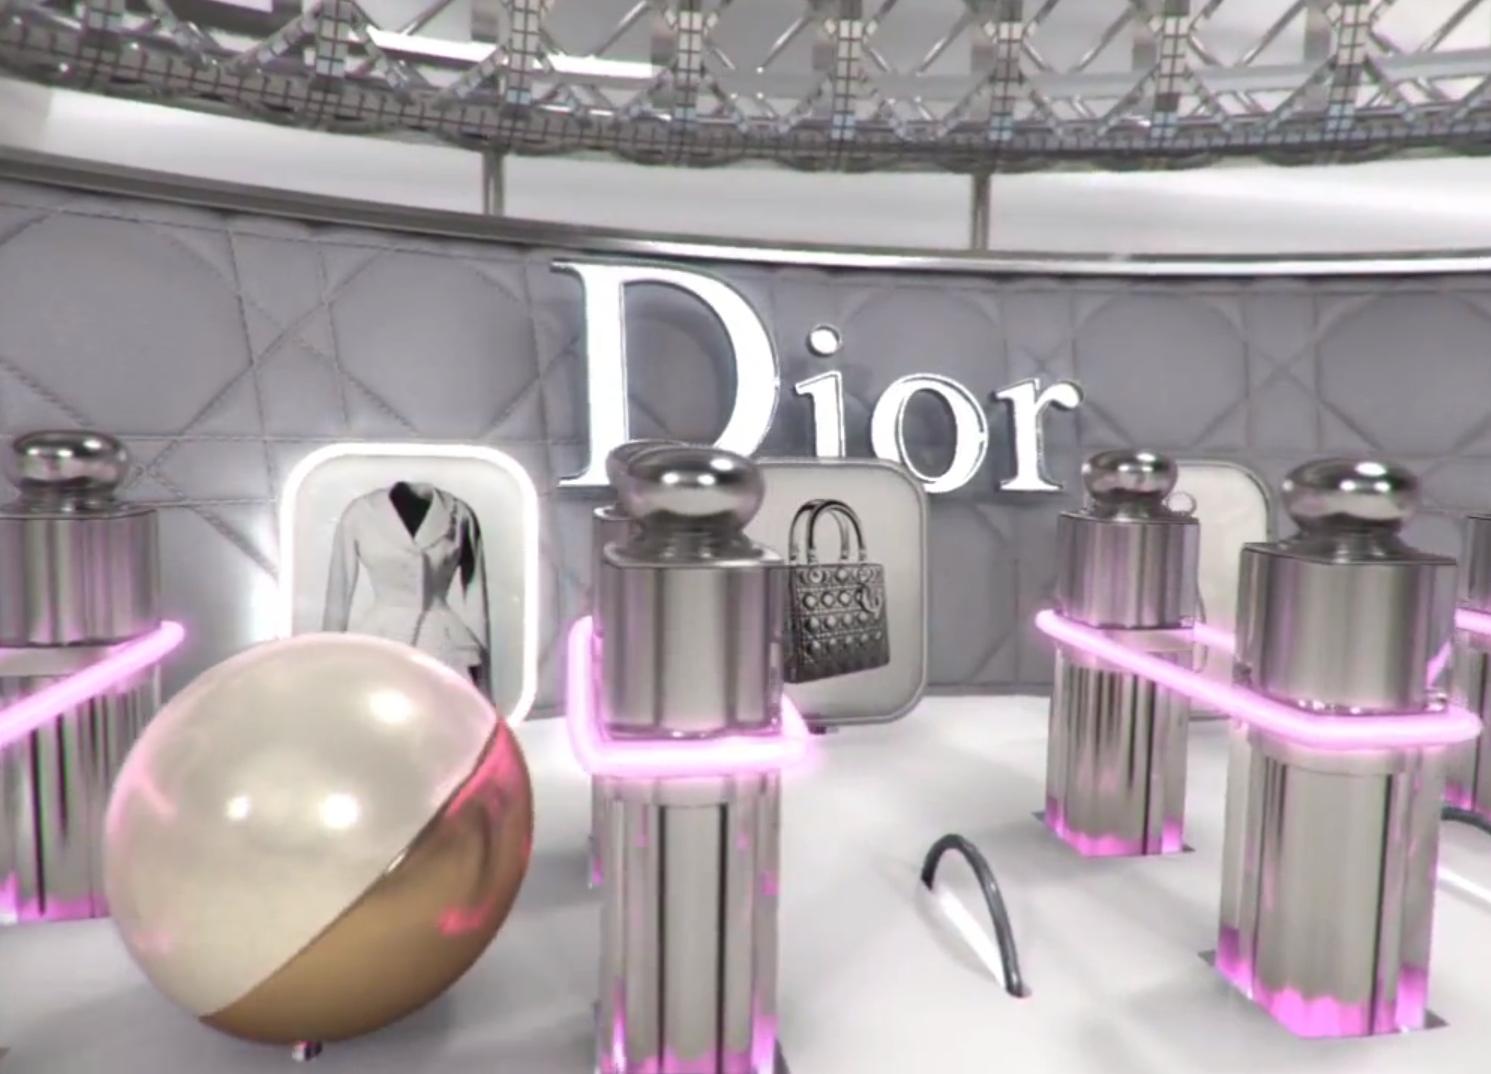 Dior logo Wallpaper